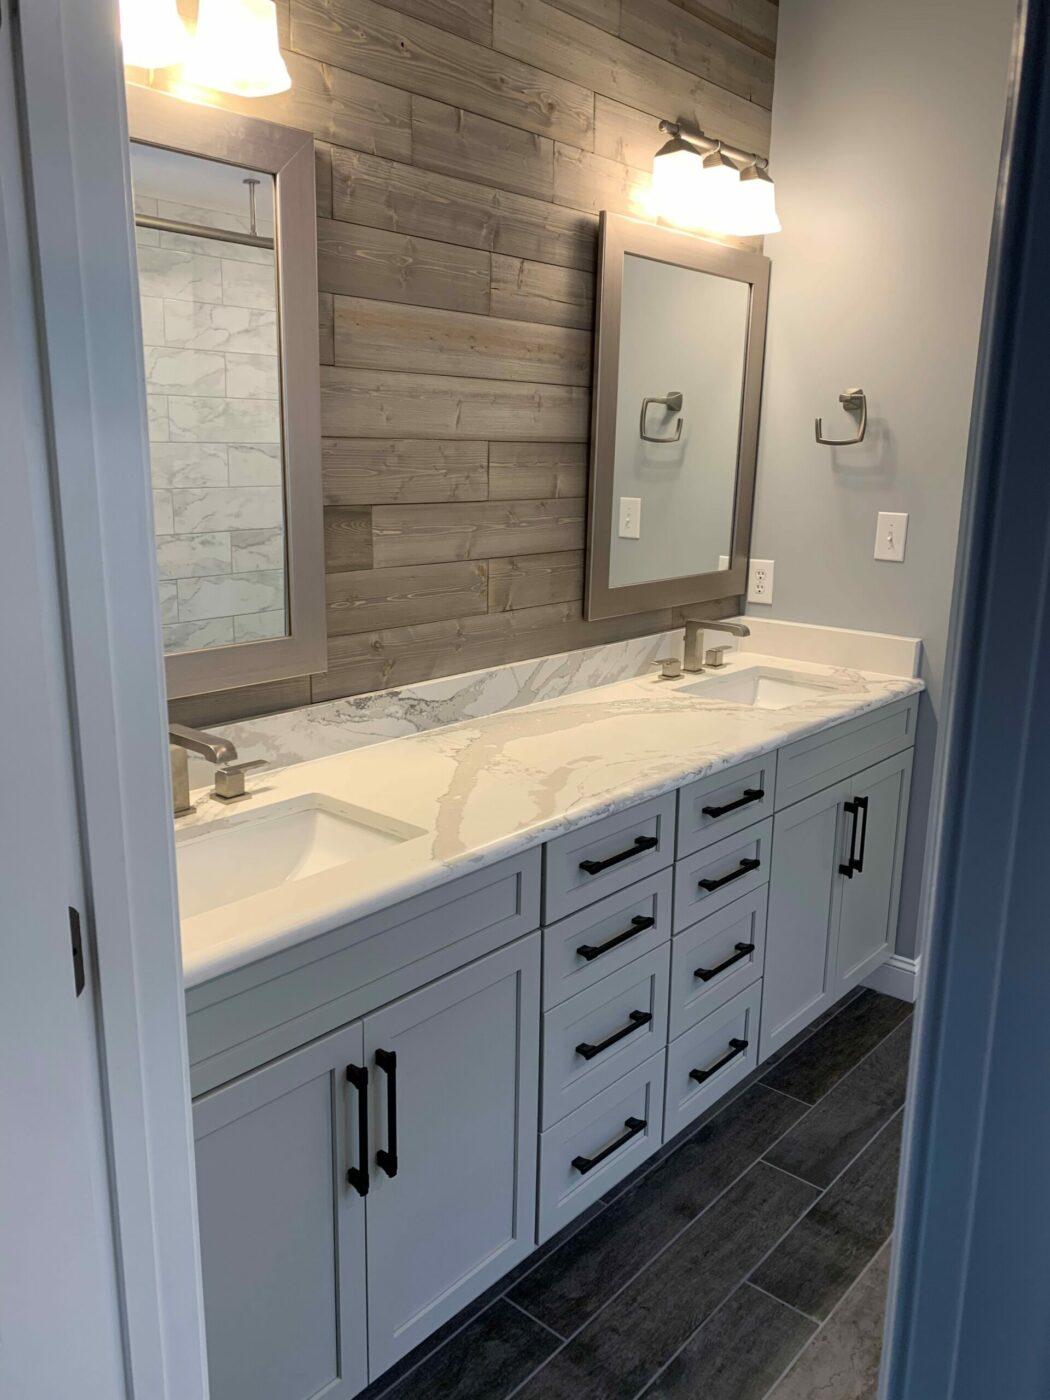 Kitchen Cabinets Raleigh Vanity Contemporary Rustic Savannah1 Alpine Hardware Marble